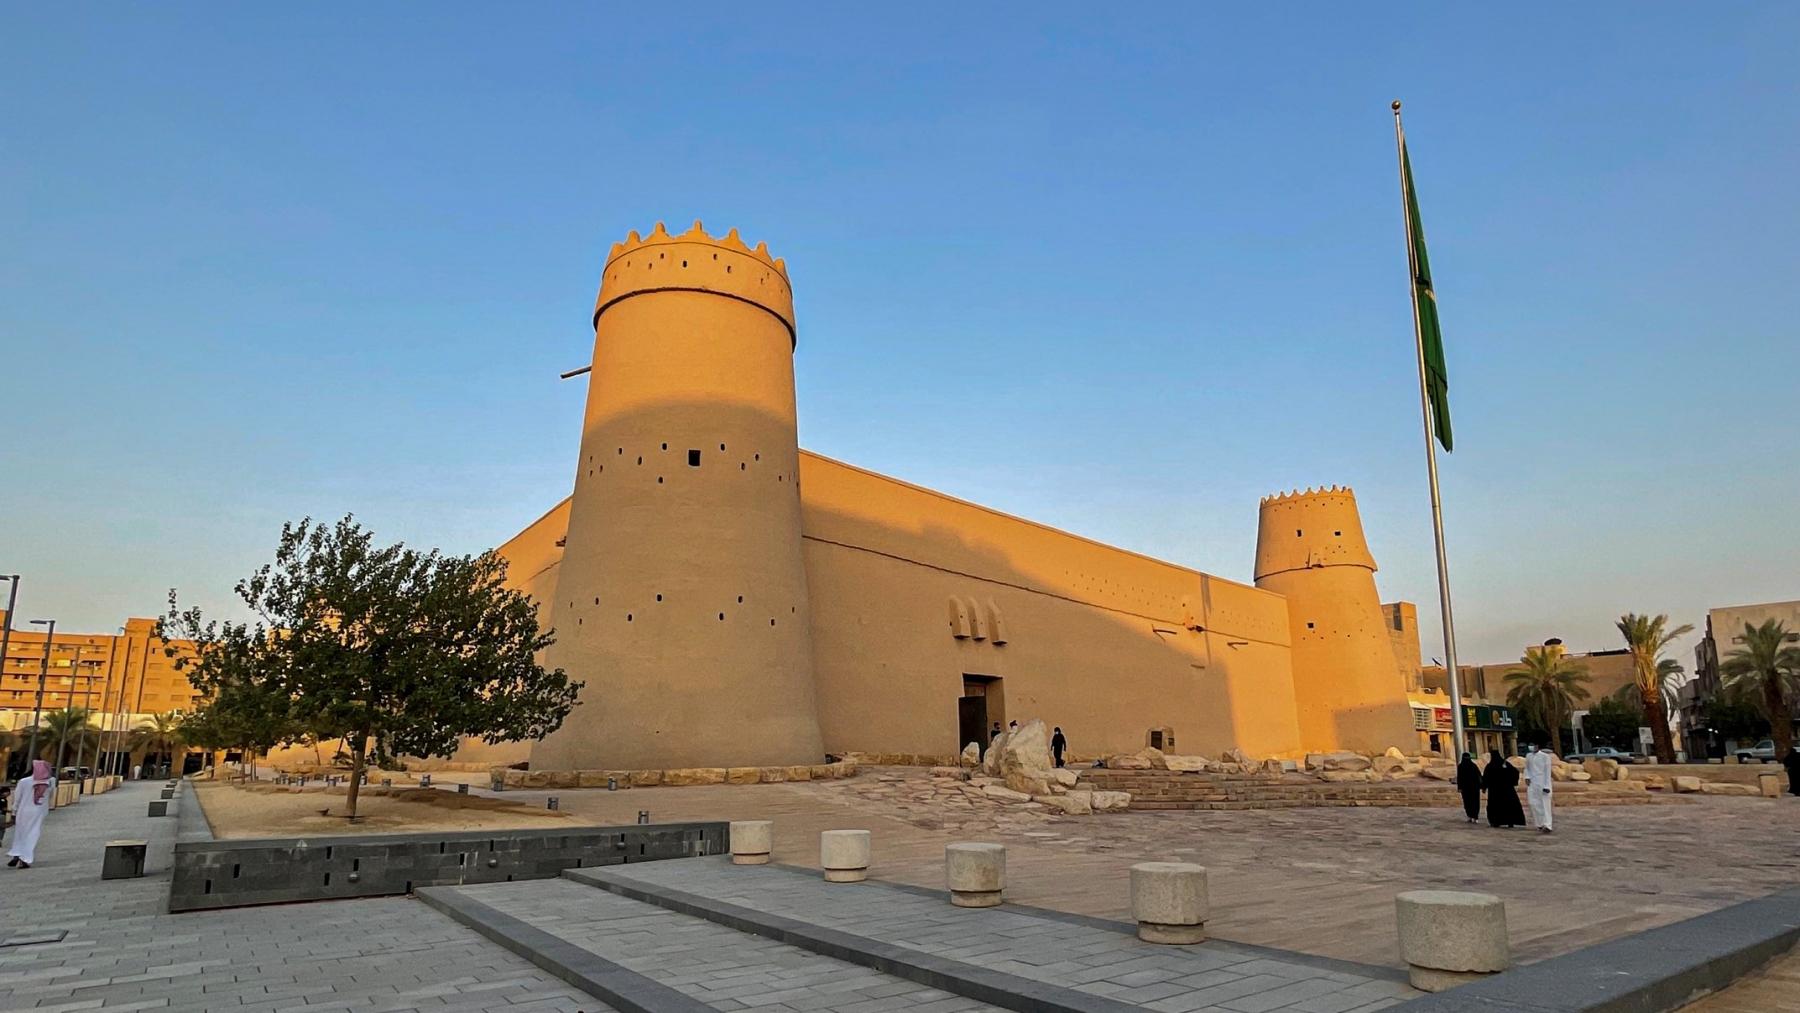 Post of the Month: Riyadh